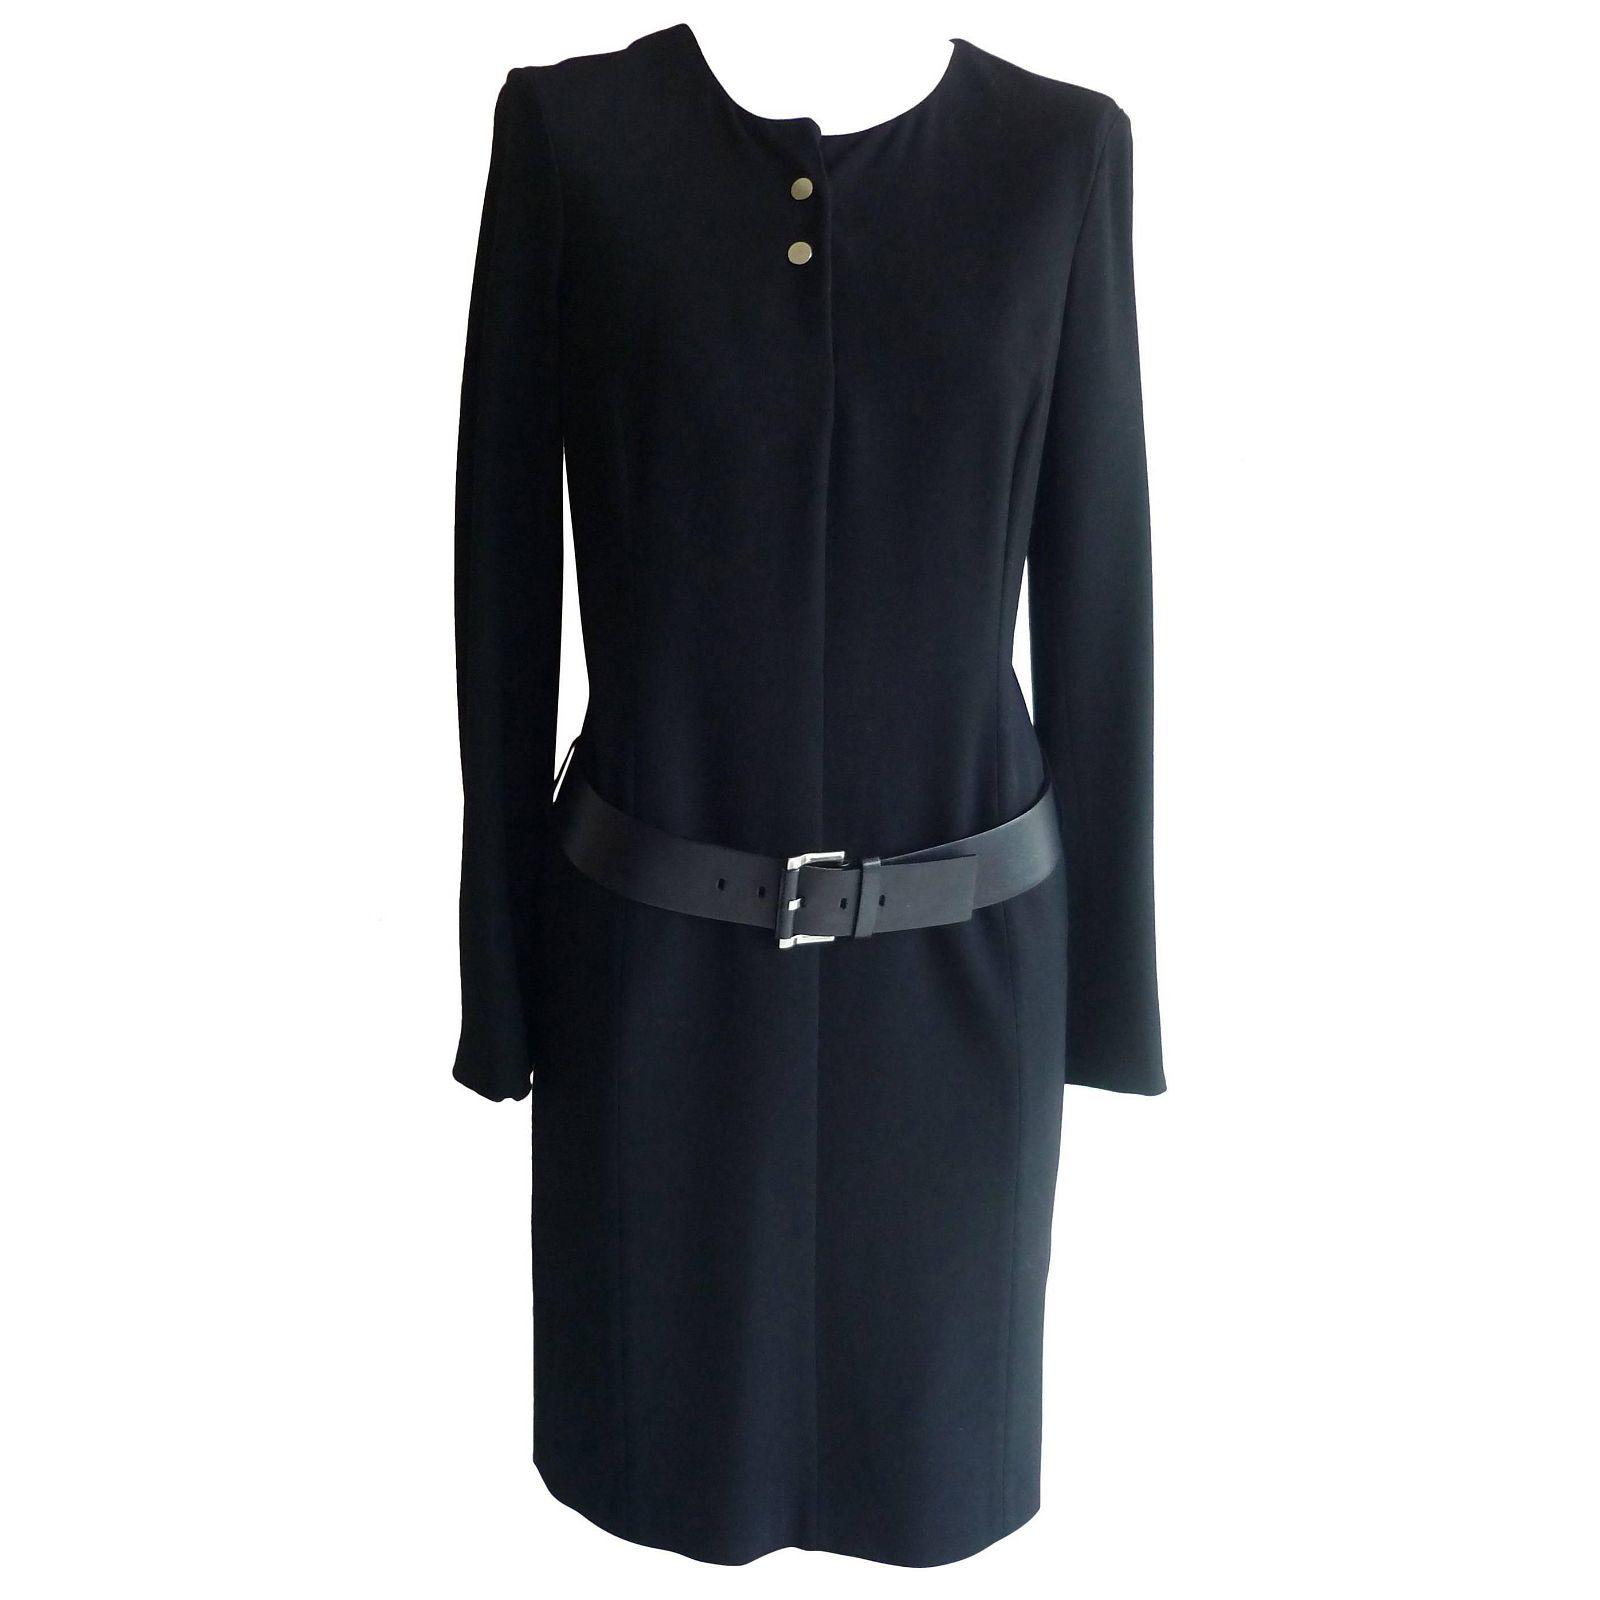 Jil Sander Black Virgin Wool Drop Waist Dress